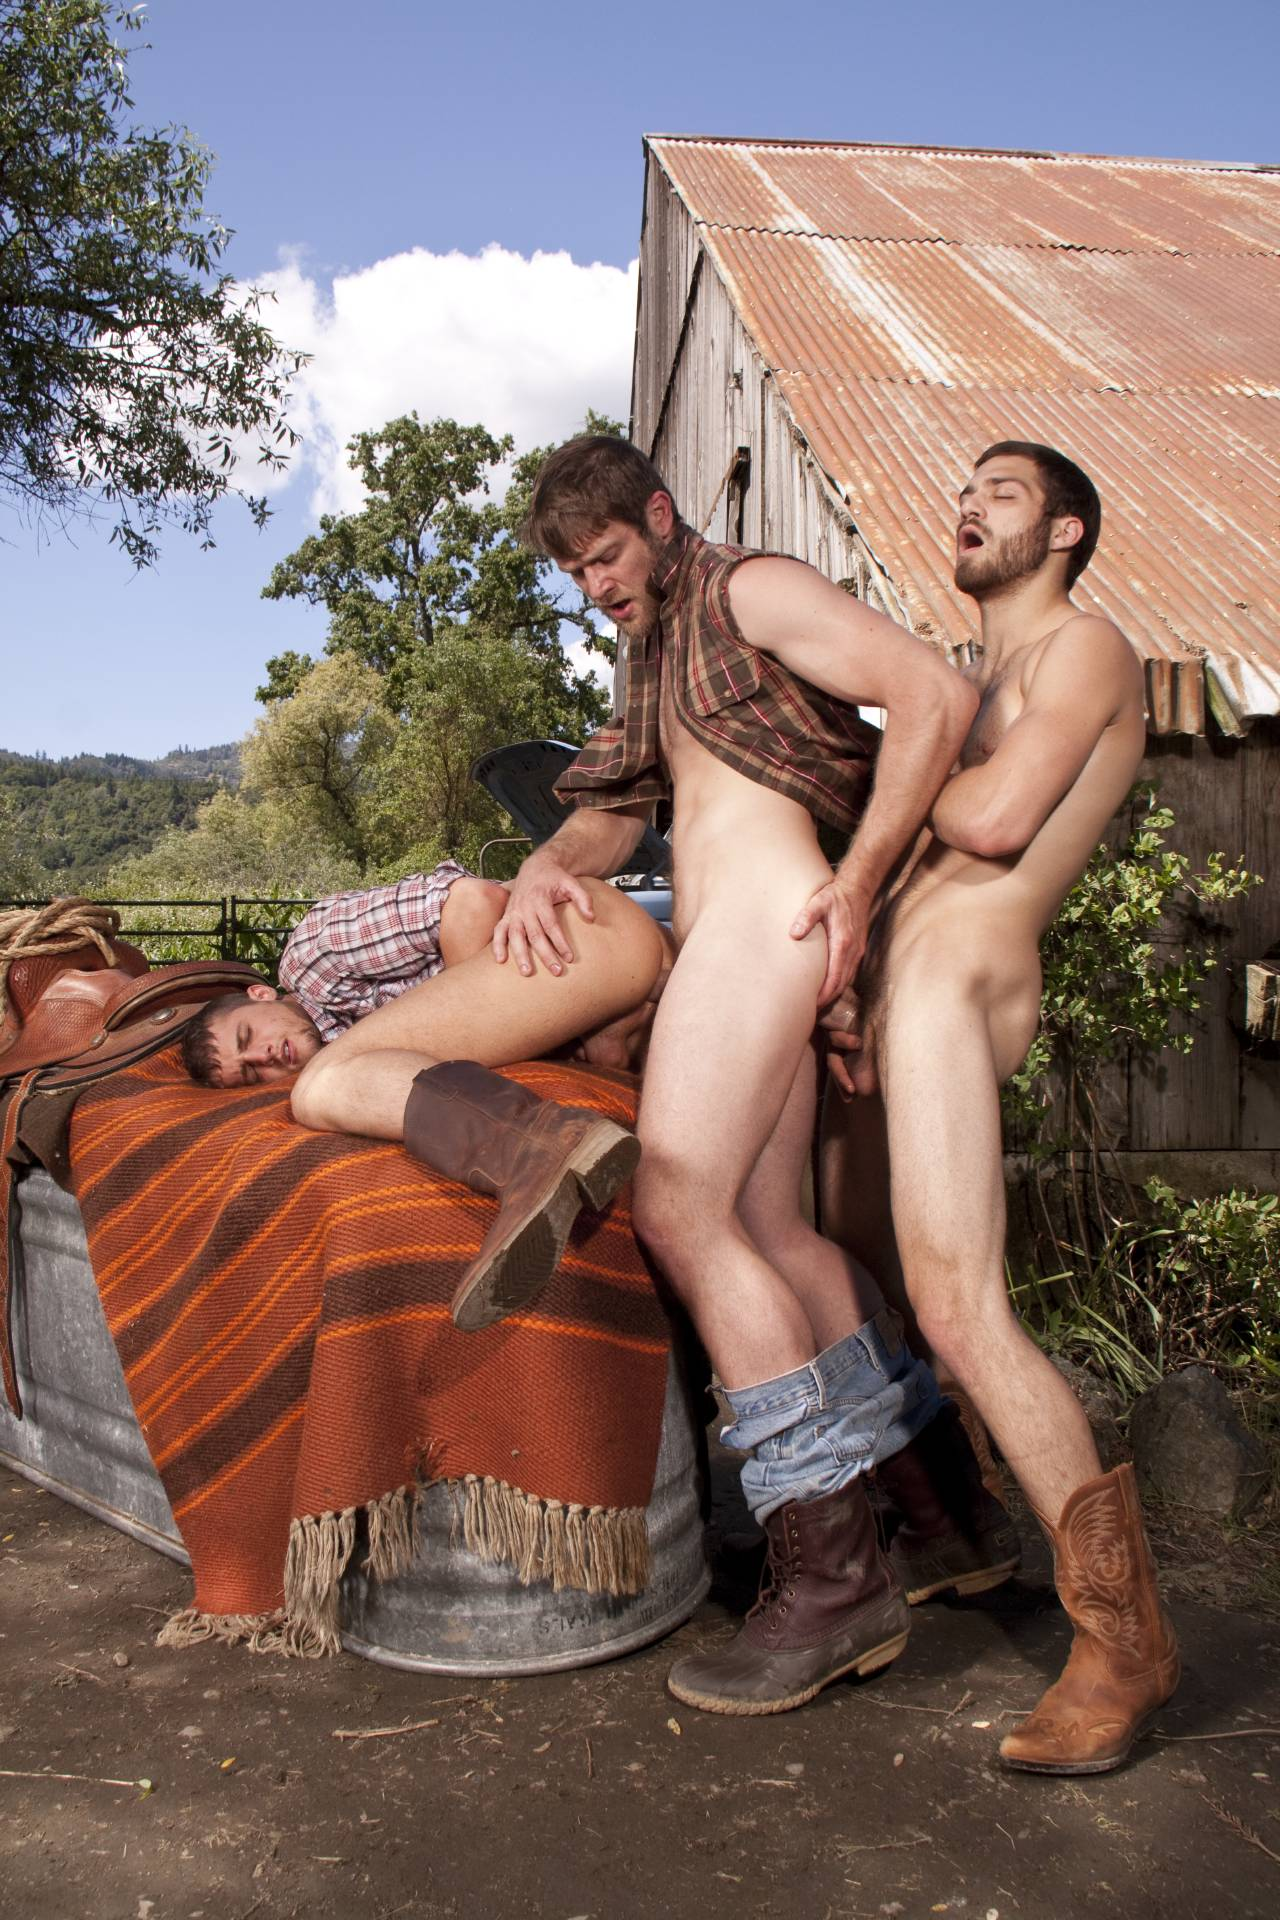 Black horny cowboy porn nadu nude mom